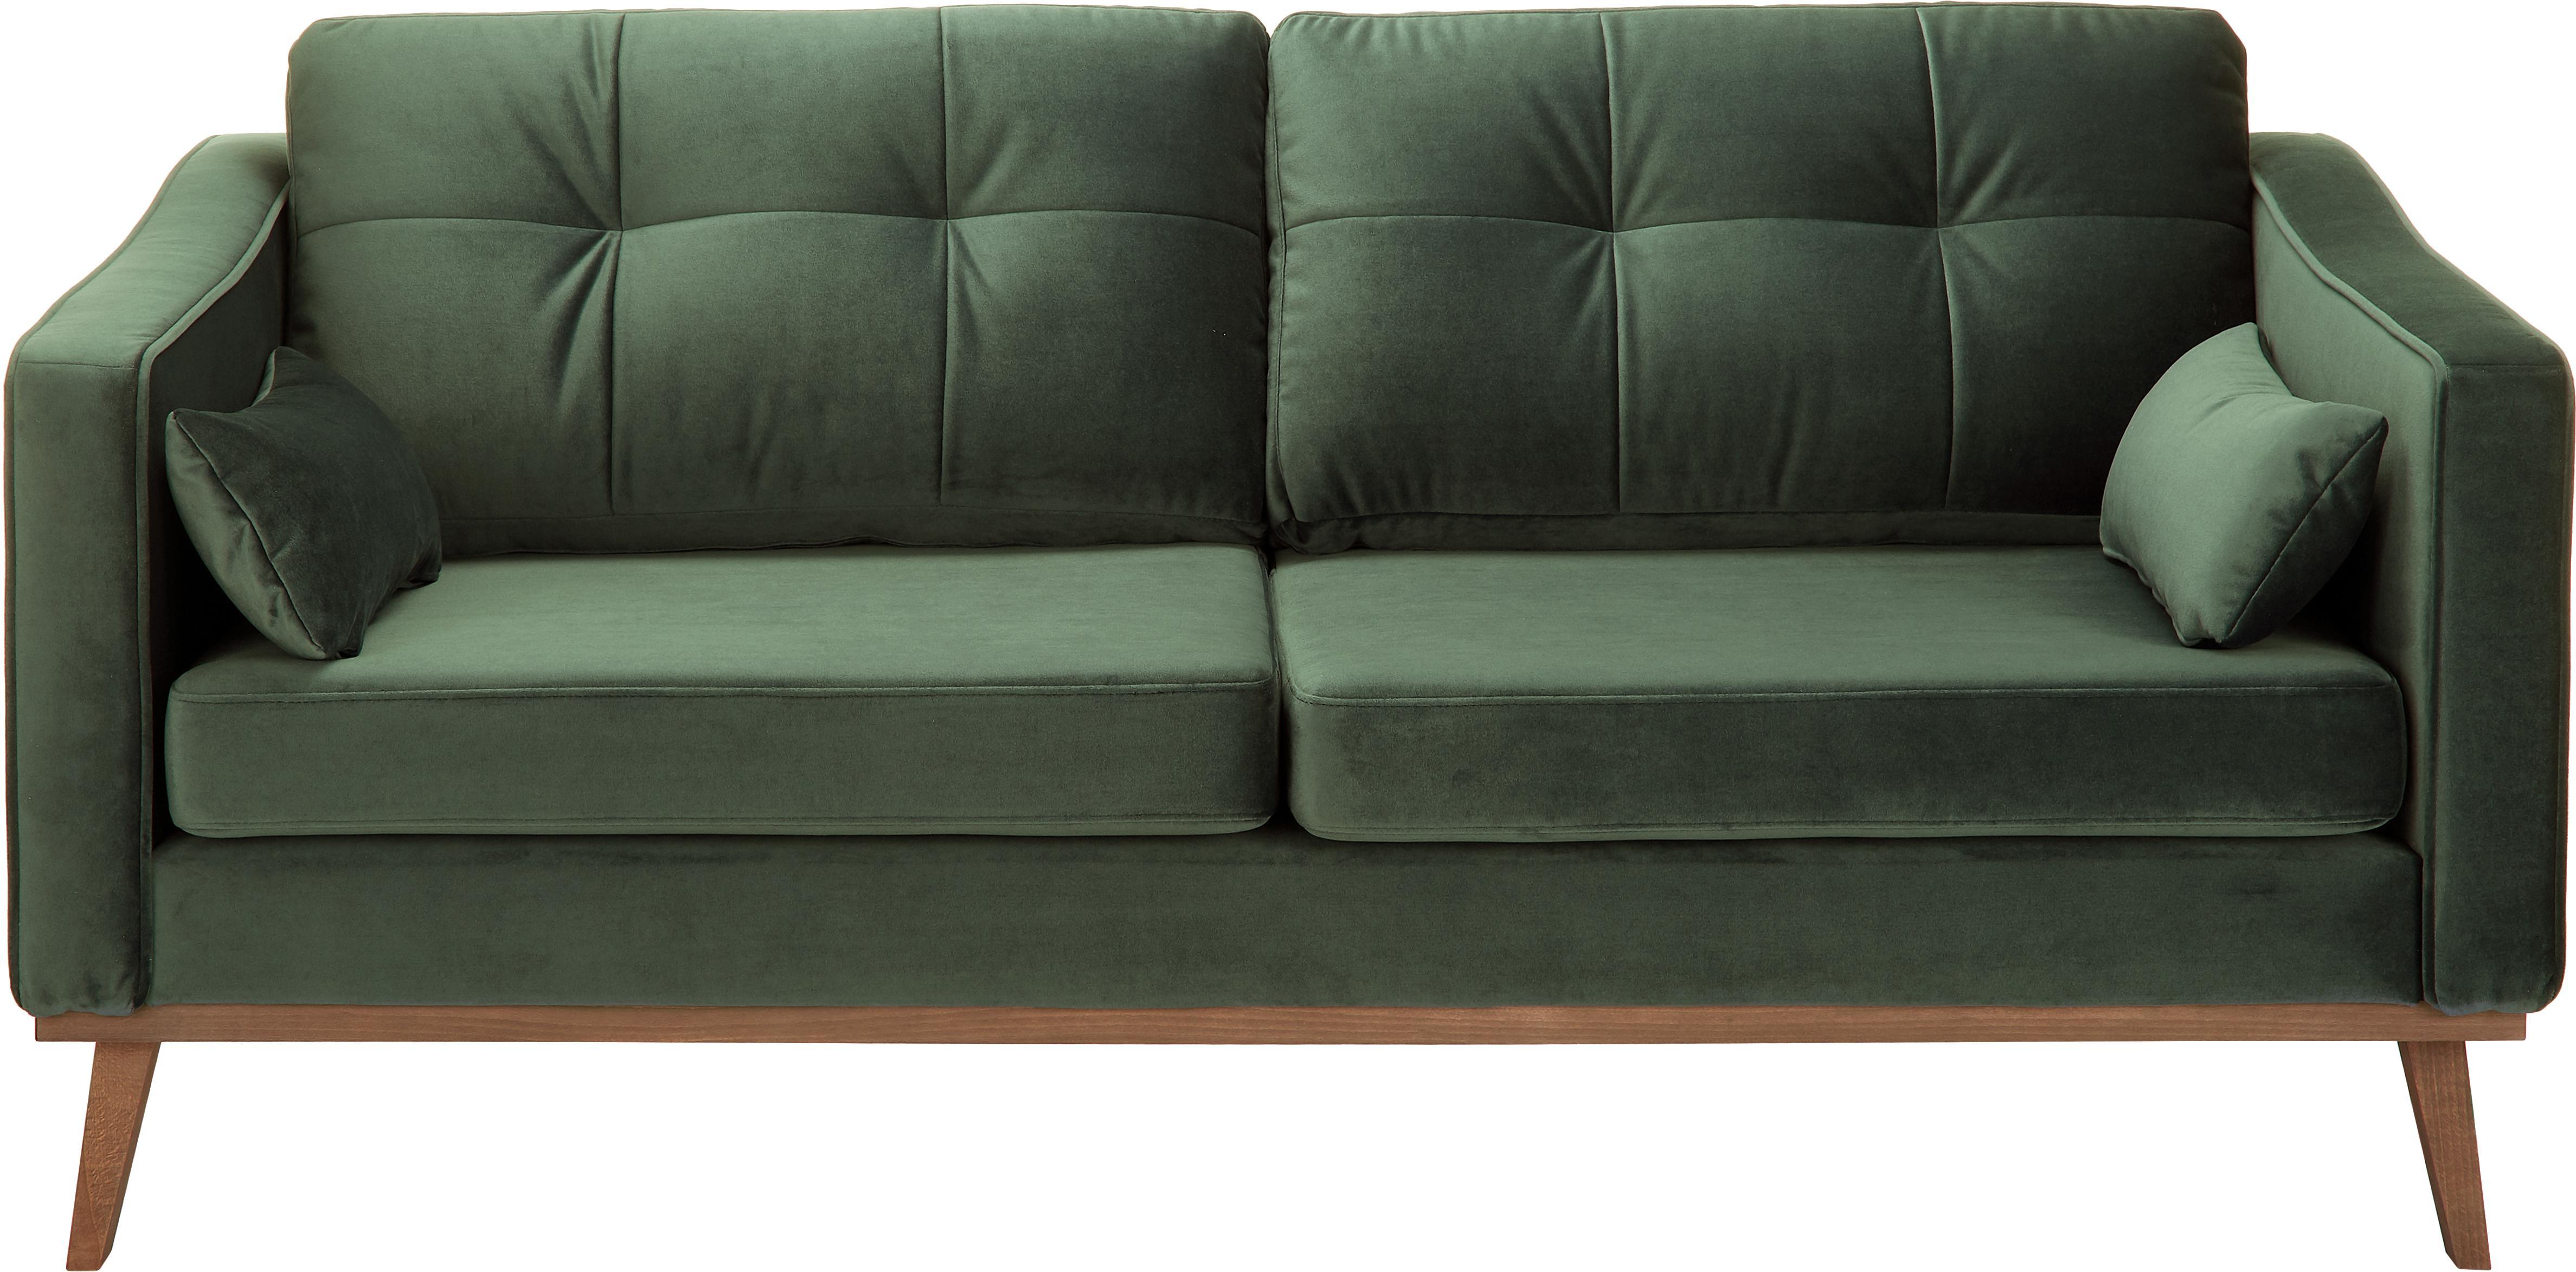 Samt-Sofa Alva (2-Sitzer), Bezug: Samt (Hochwertiger Polyes, Gestell: Massives Kiefernholz, Füße: Massives Buchenholz, gebe, Samt Olive, B 184 x T 92 cm